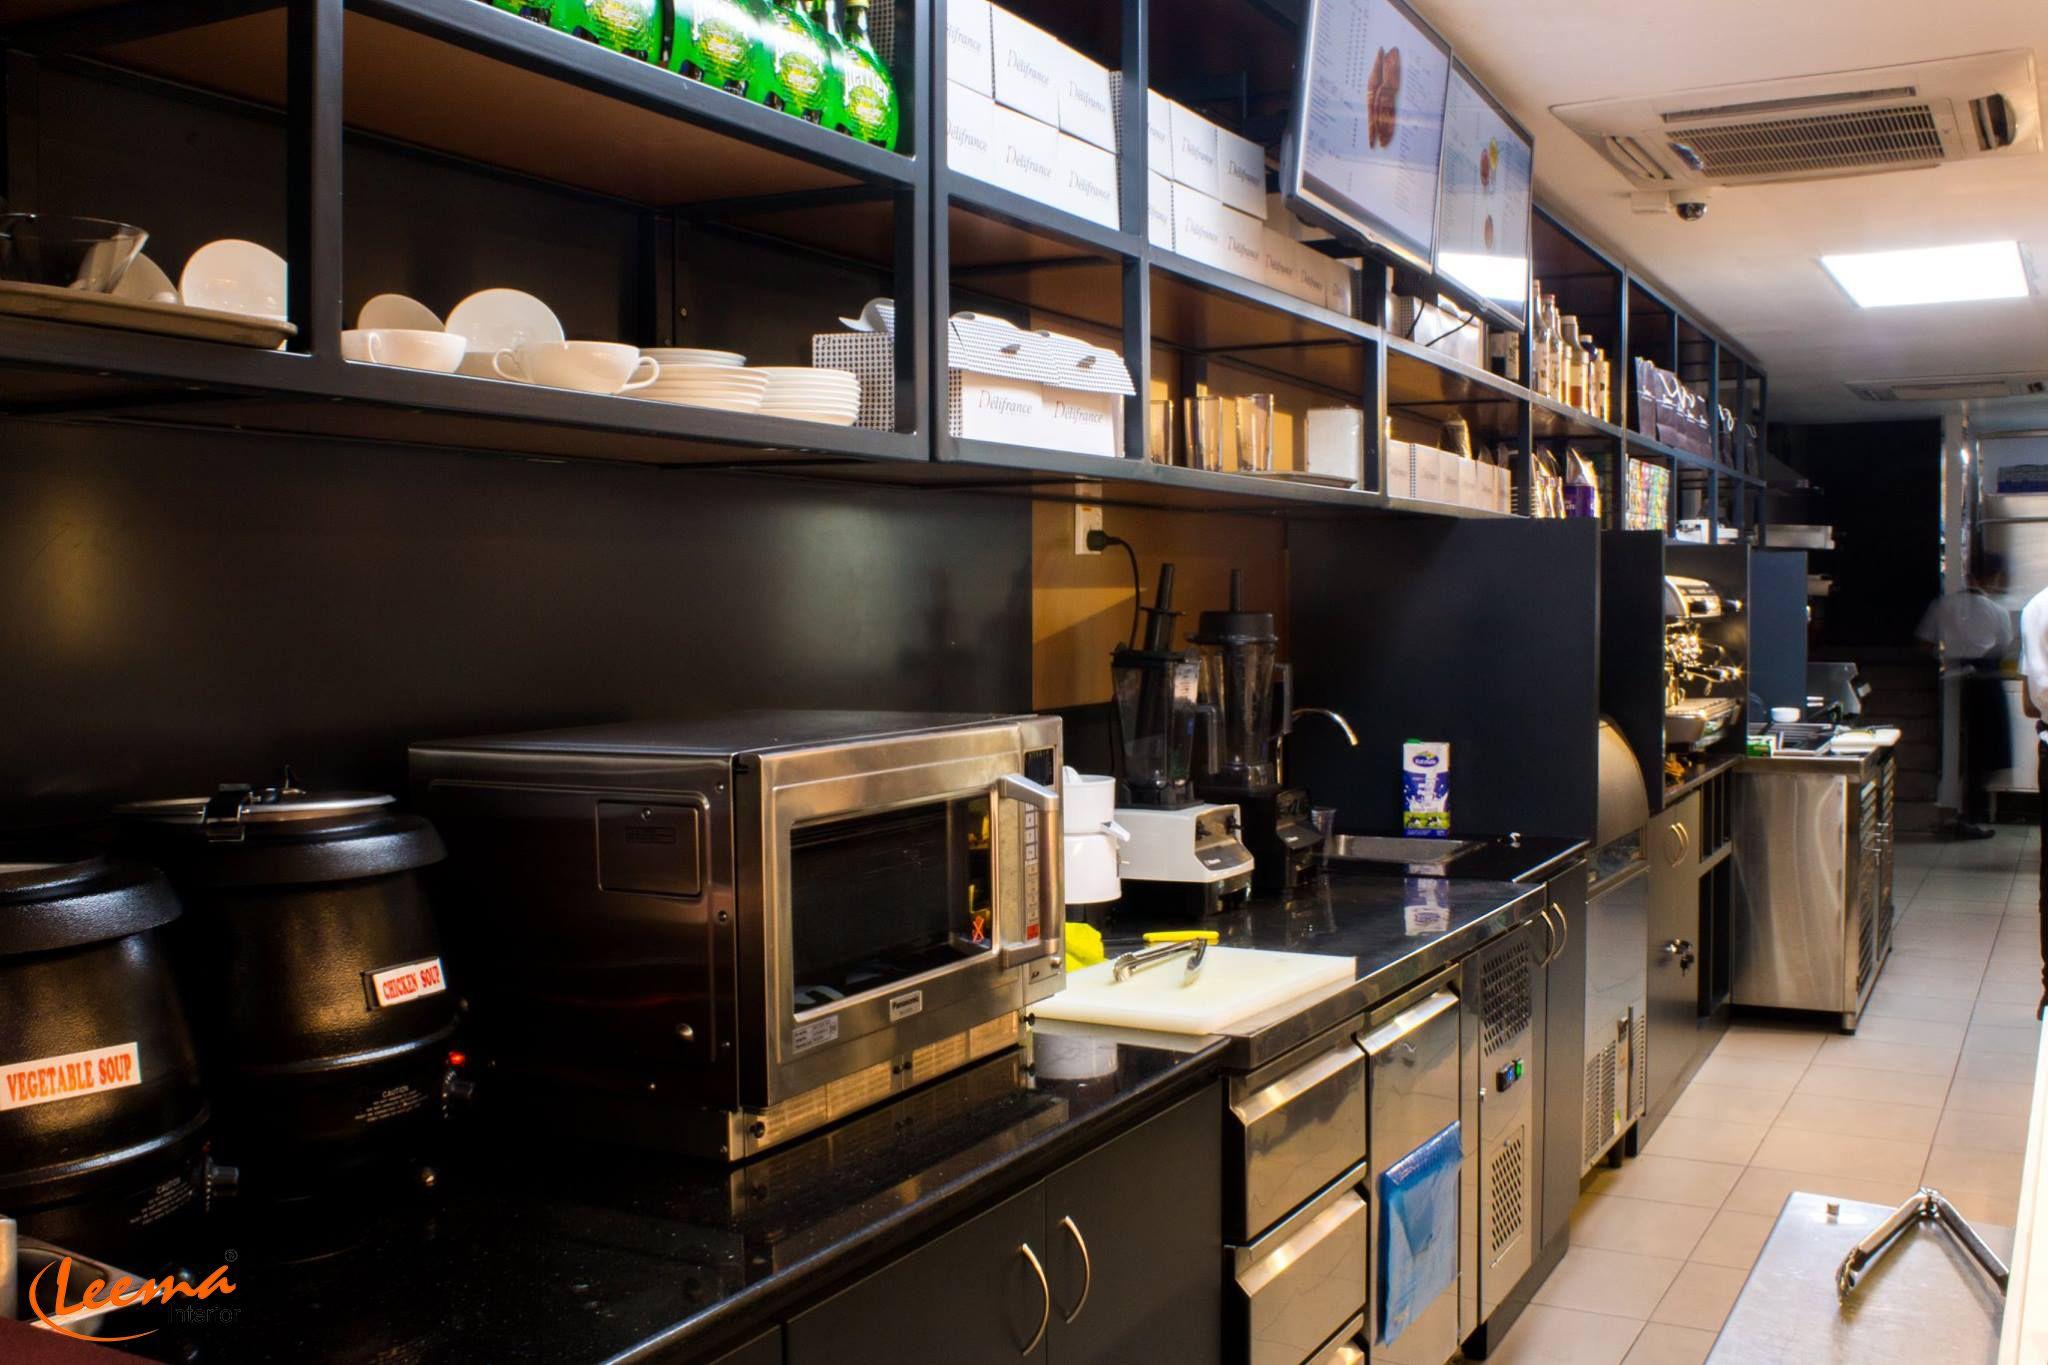 Restaurant food beverage decoration interior design sri lanka home decor also rh ar pinterest